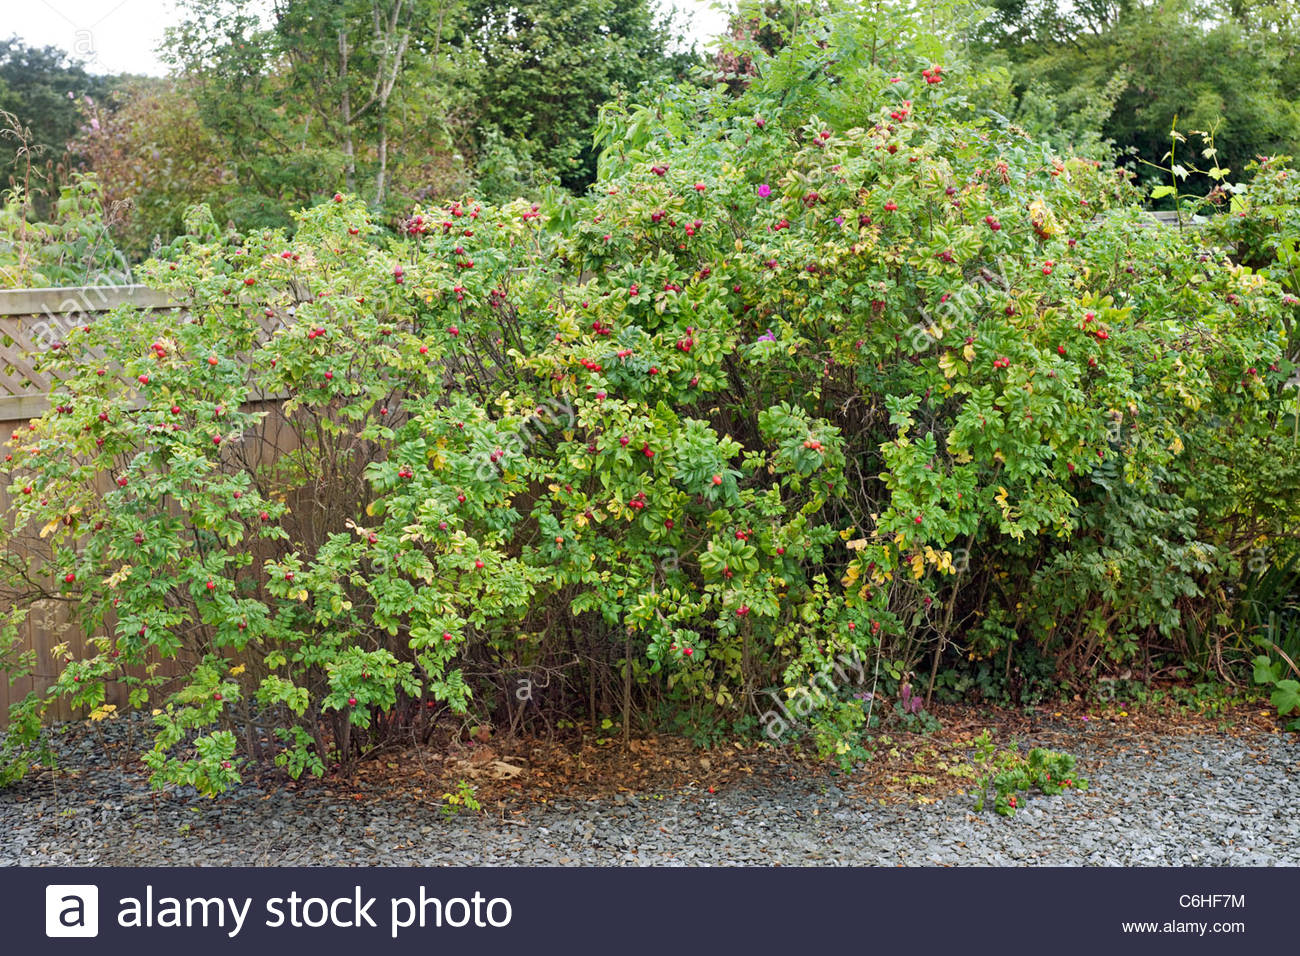 Rosa rugosa hedge - Stock Image